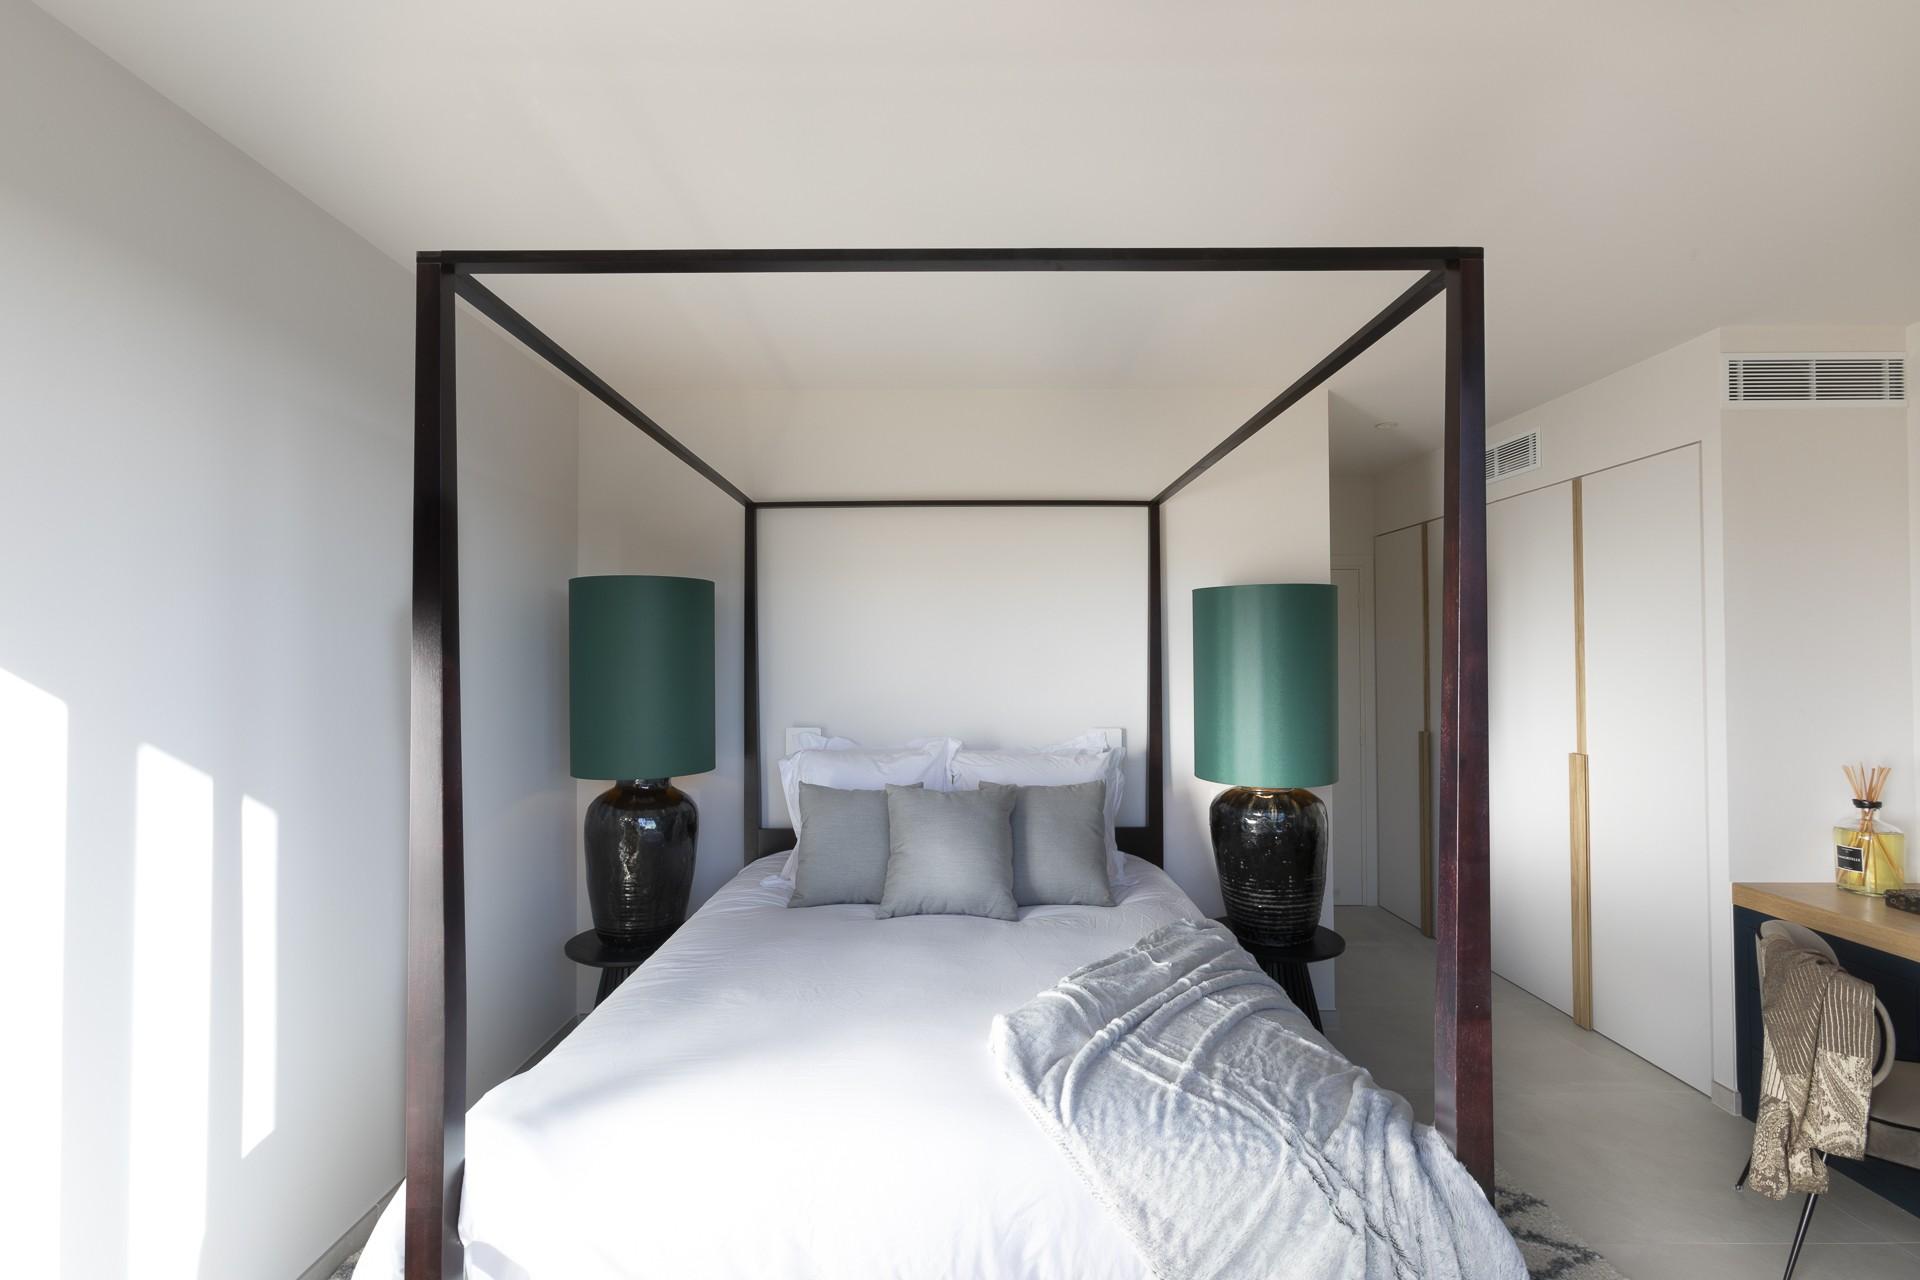 Porto Vecchio Luxury Rental Villa Perle Bedroom 6